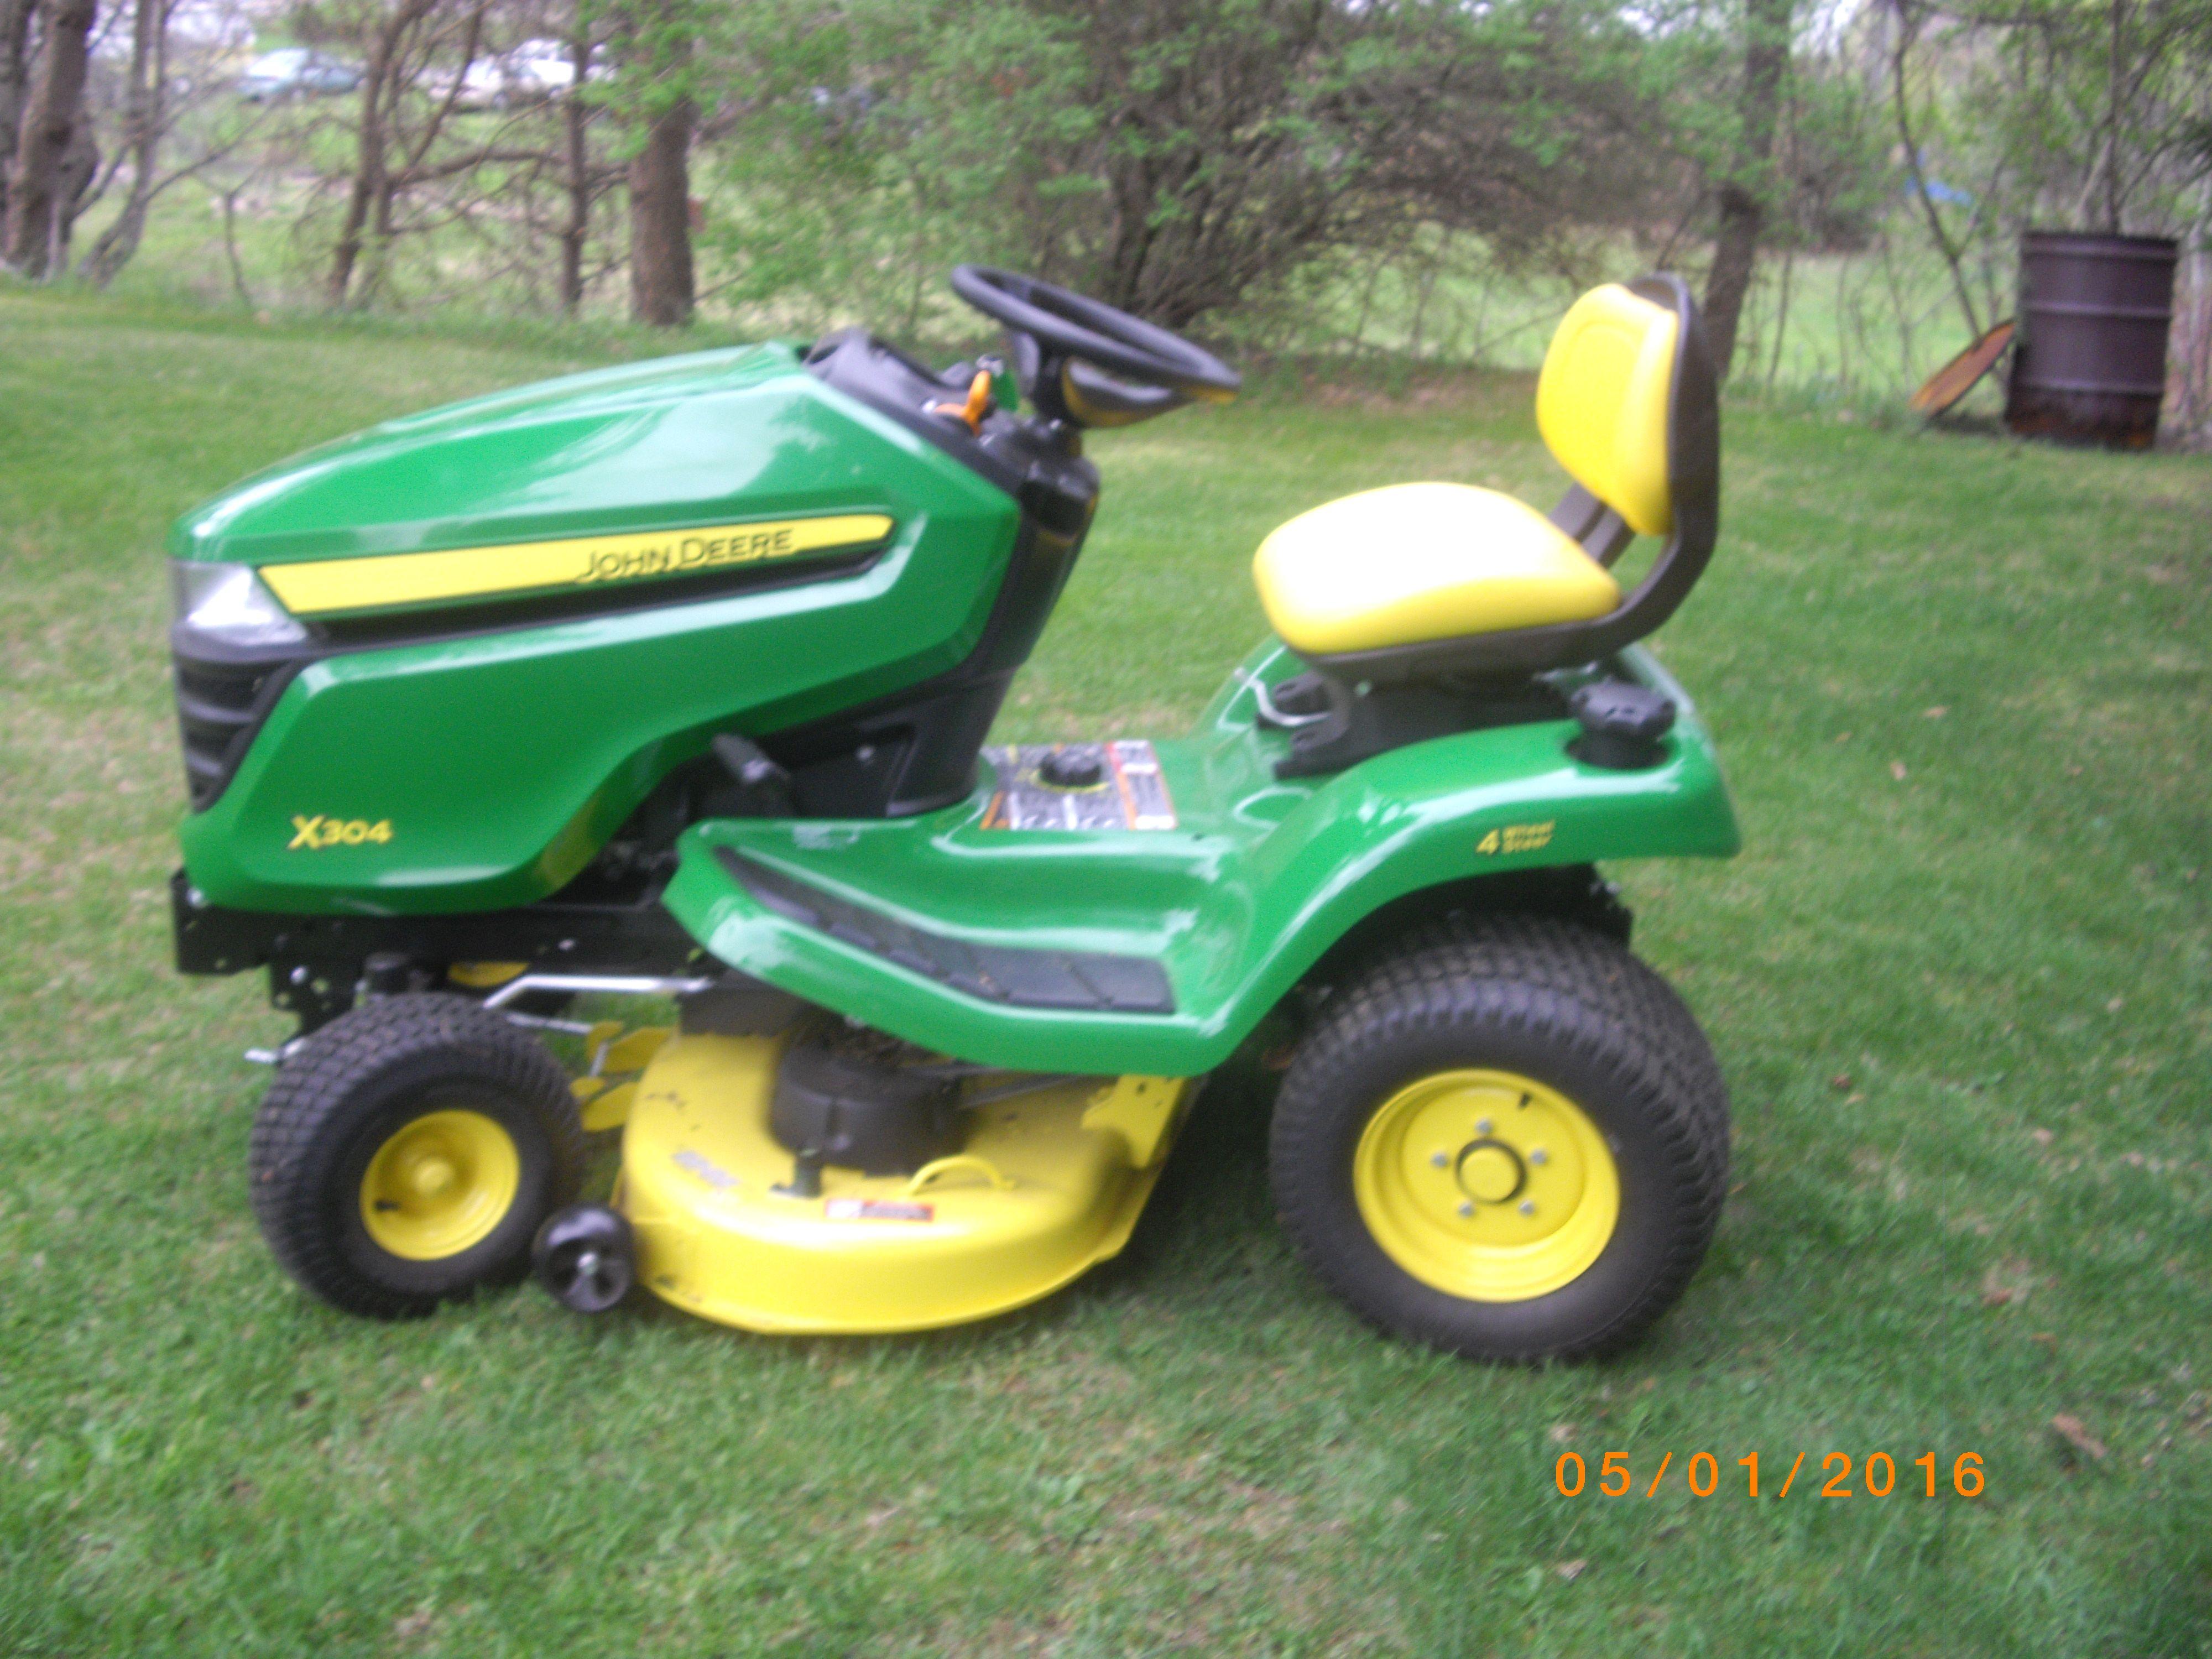 John Deere X748 Utility Garden Tractor Diesel 24hp Hydro 4x4 54